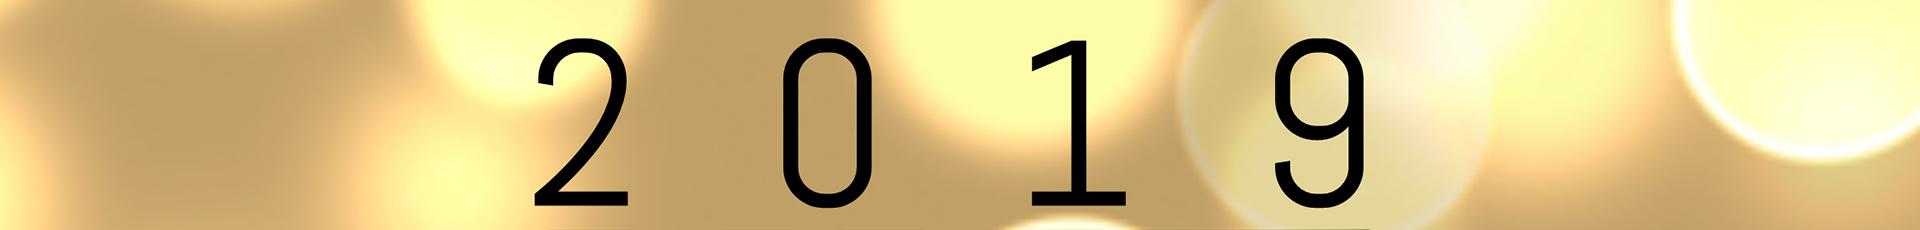 Nieuwjaarsgala 19 januari 2019